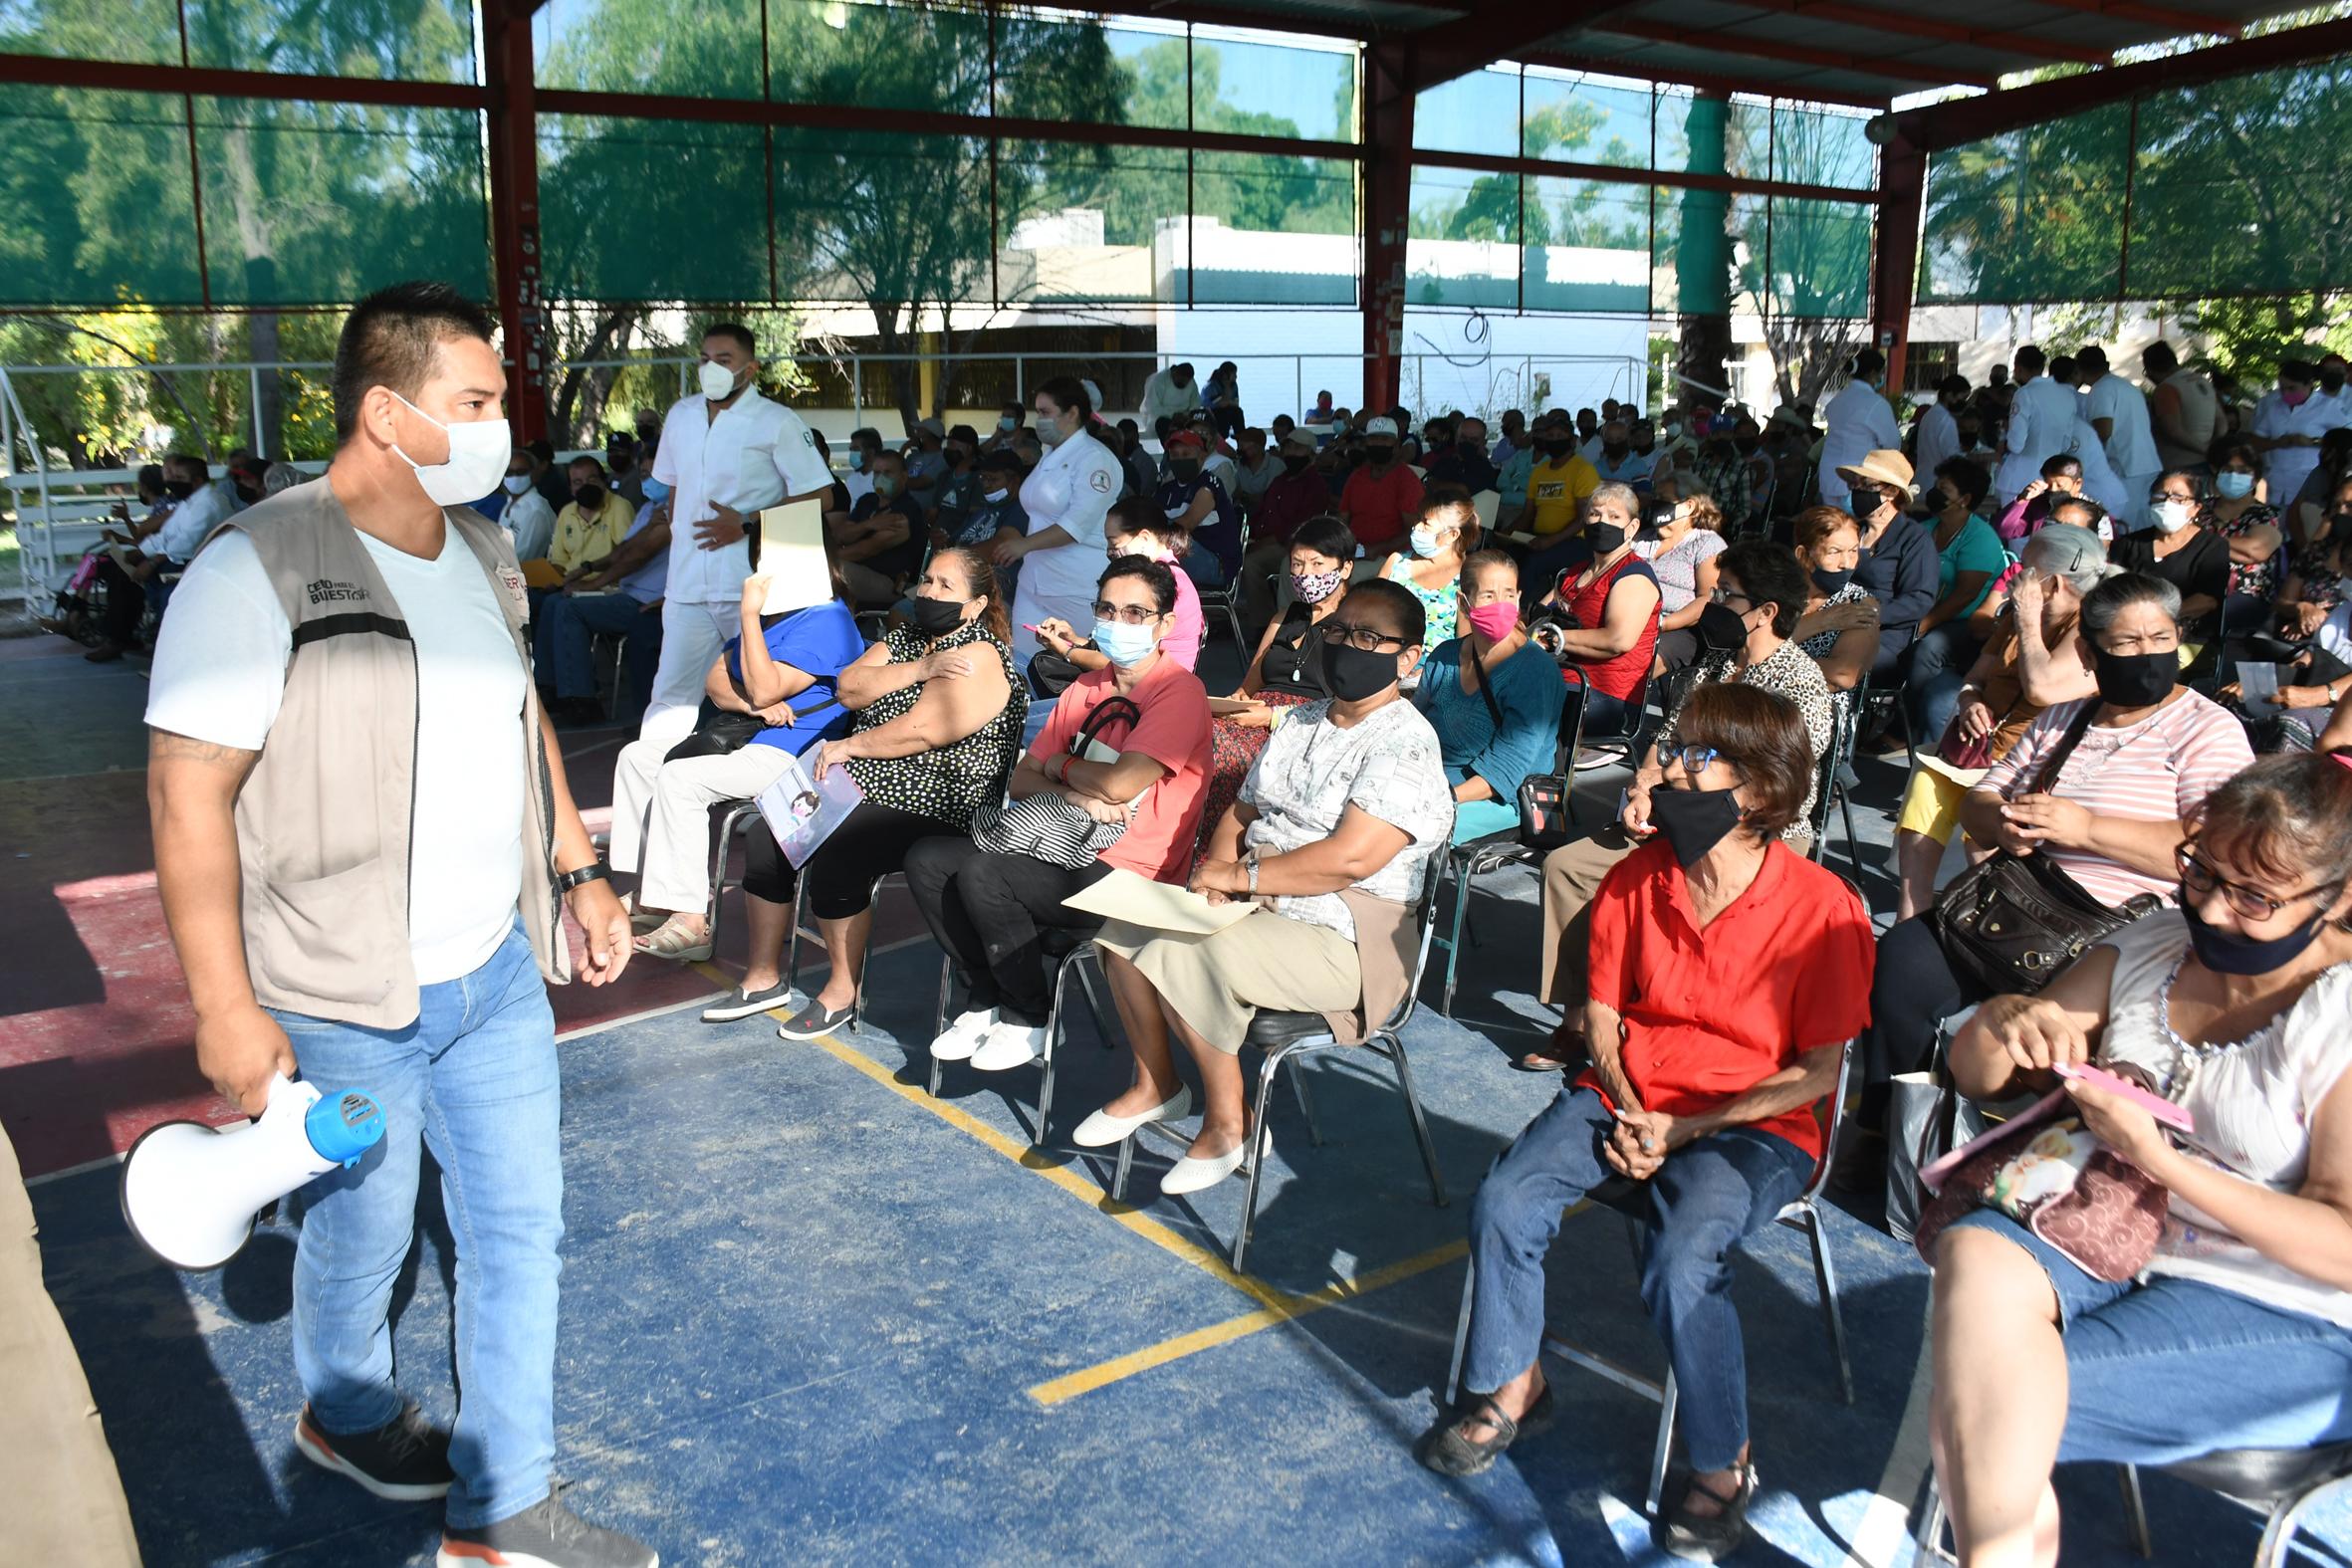 Inicia hoy vacunación antiCOVID para rezagados en Torreón